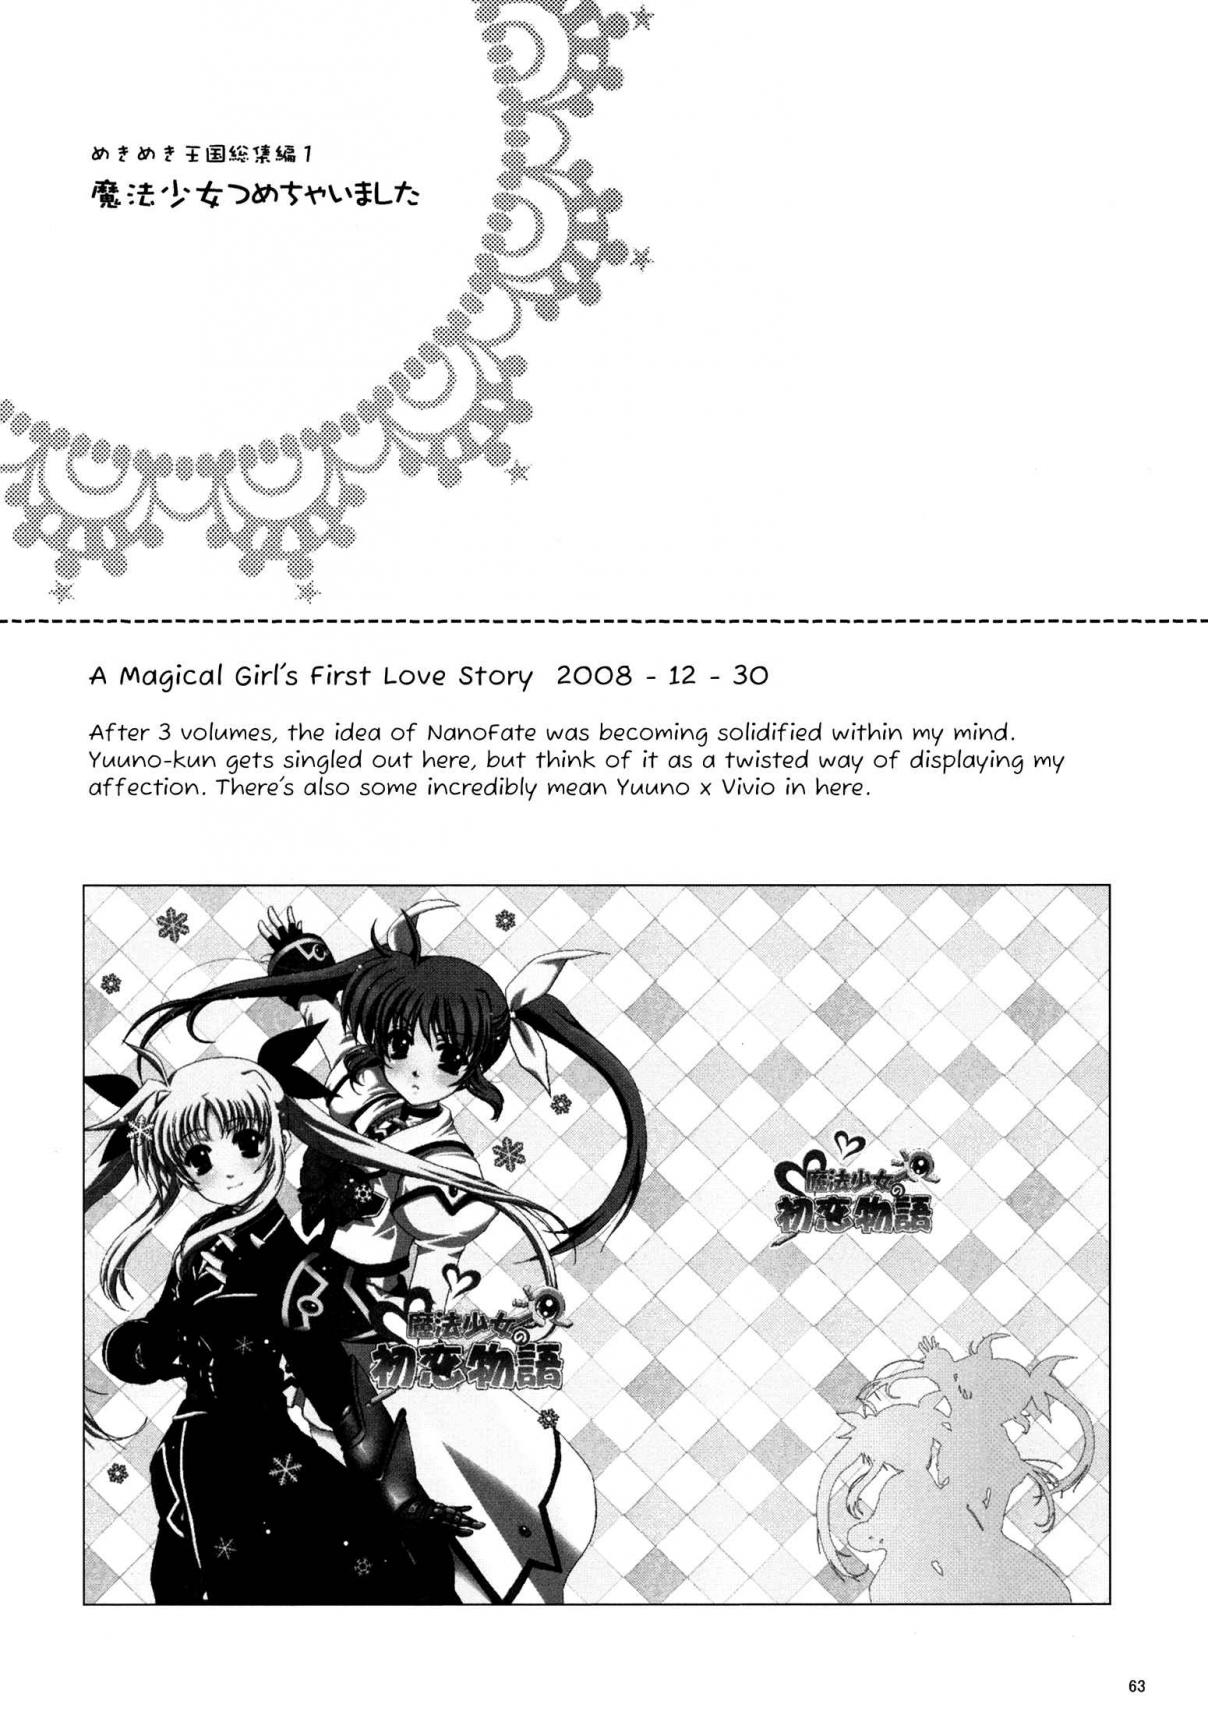 https://img2.nineanime.com/comics/pic2/15/30415/815204/ced45f7725168b5e28435cce2ac509a7.jpg Page 1